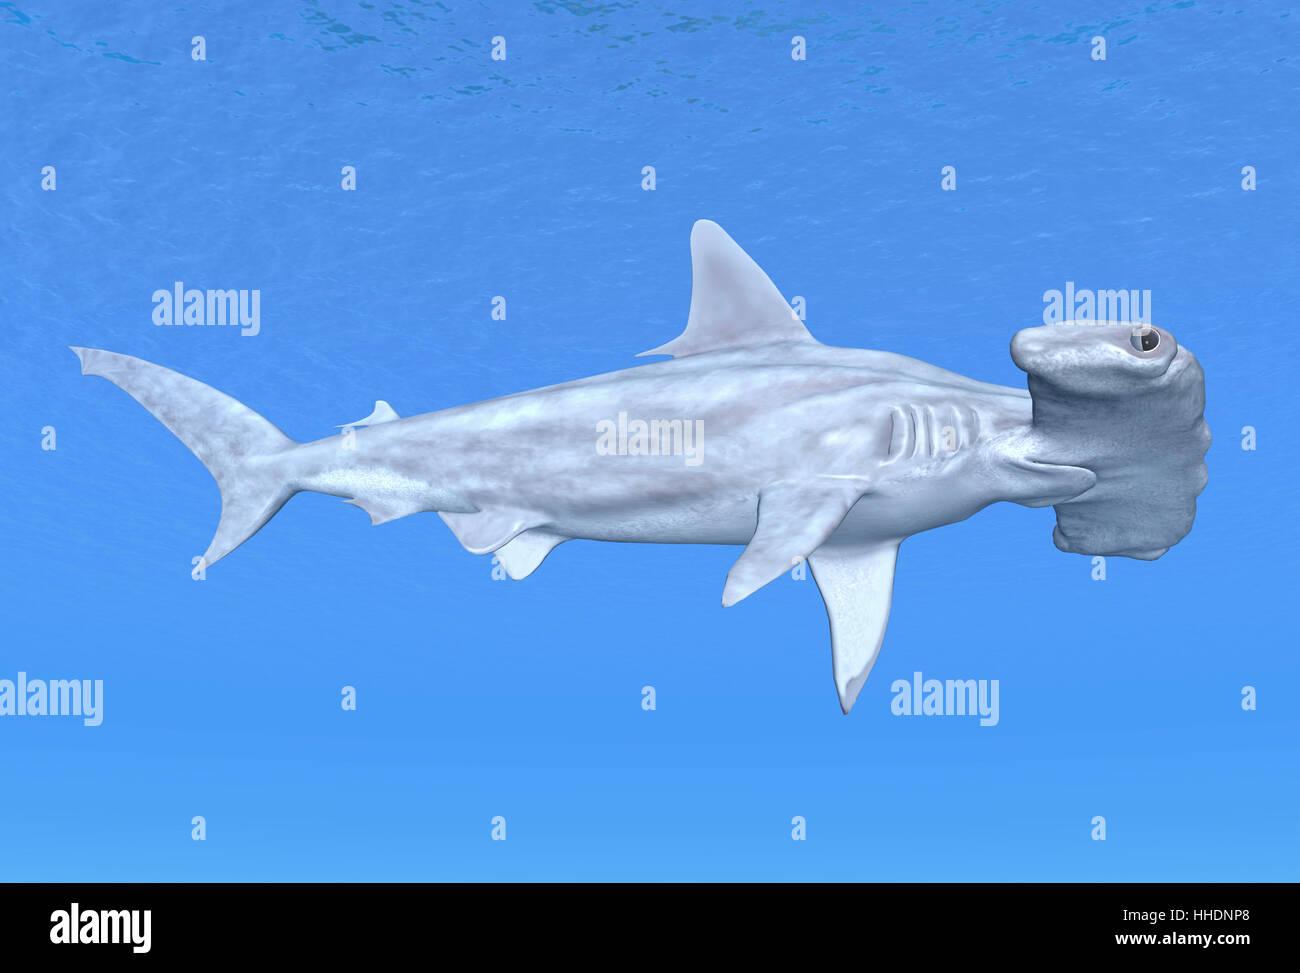 shark hammerhead sharks blue animals fish underwater